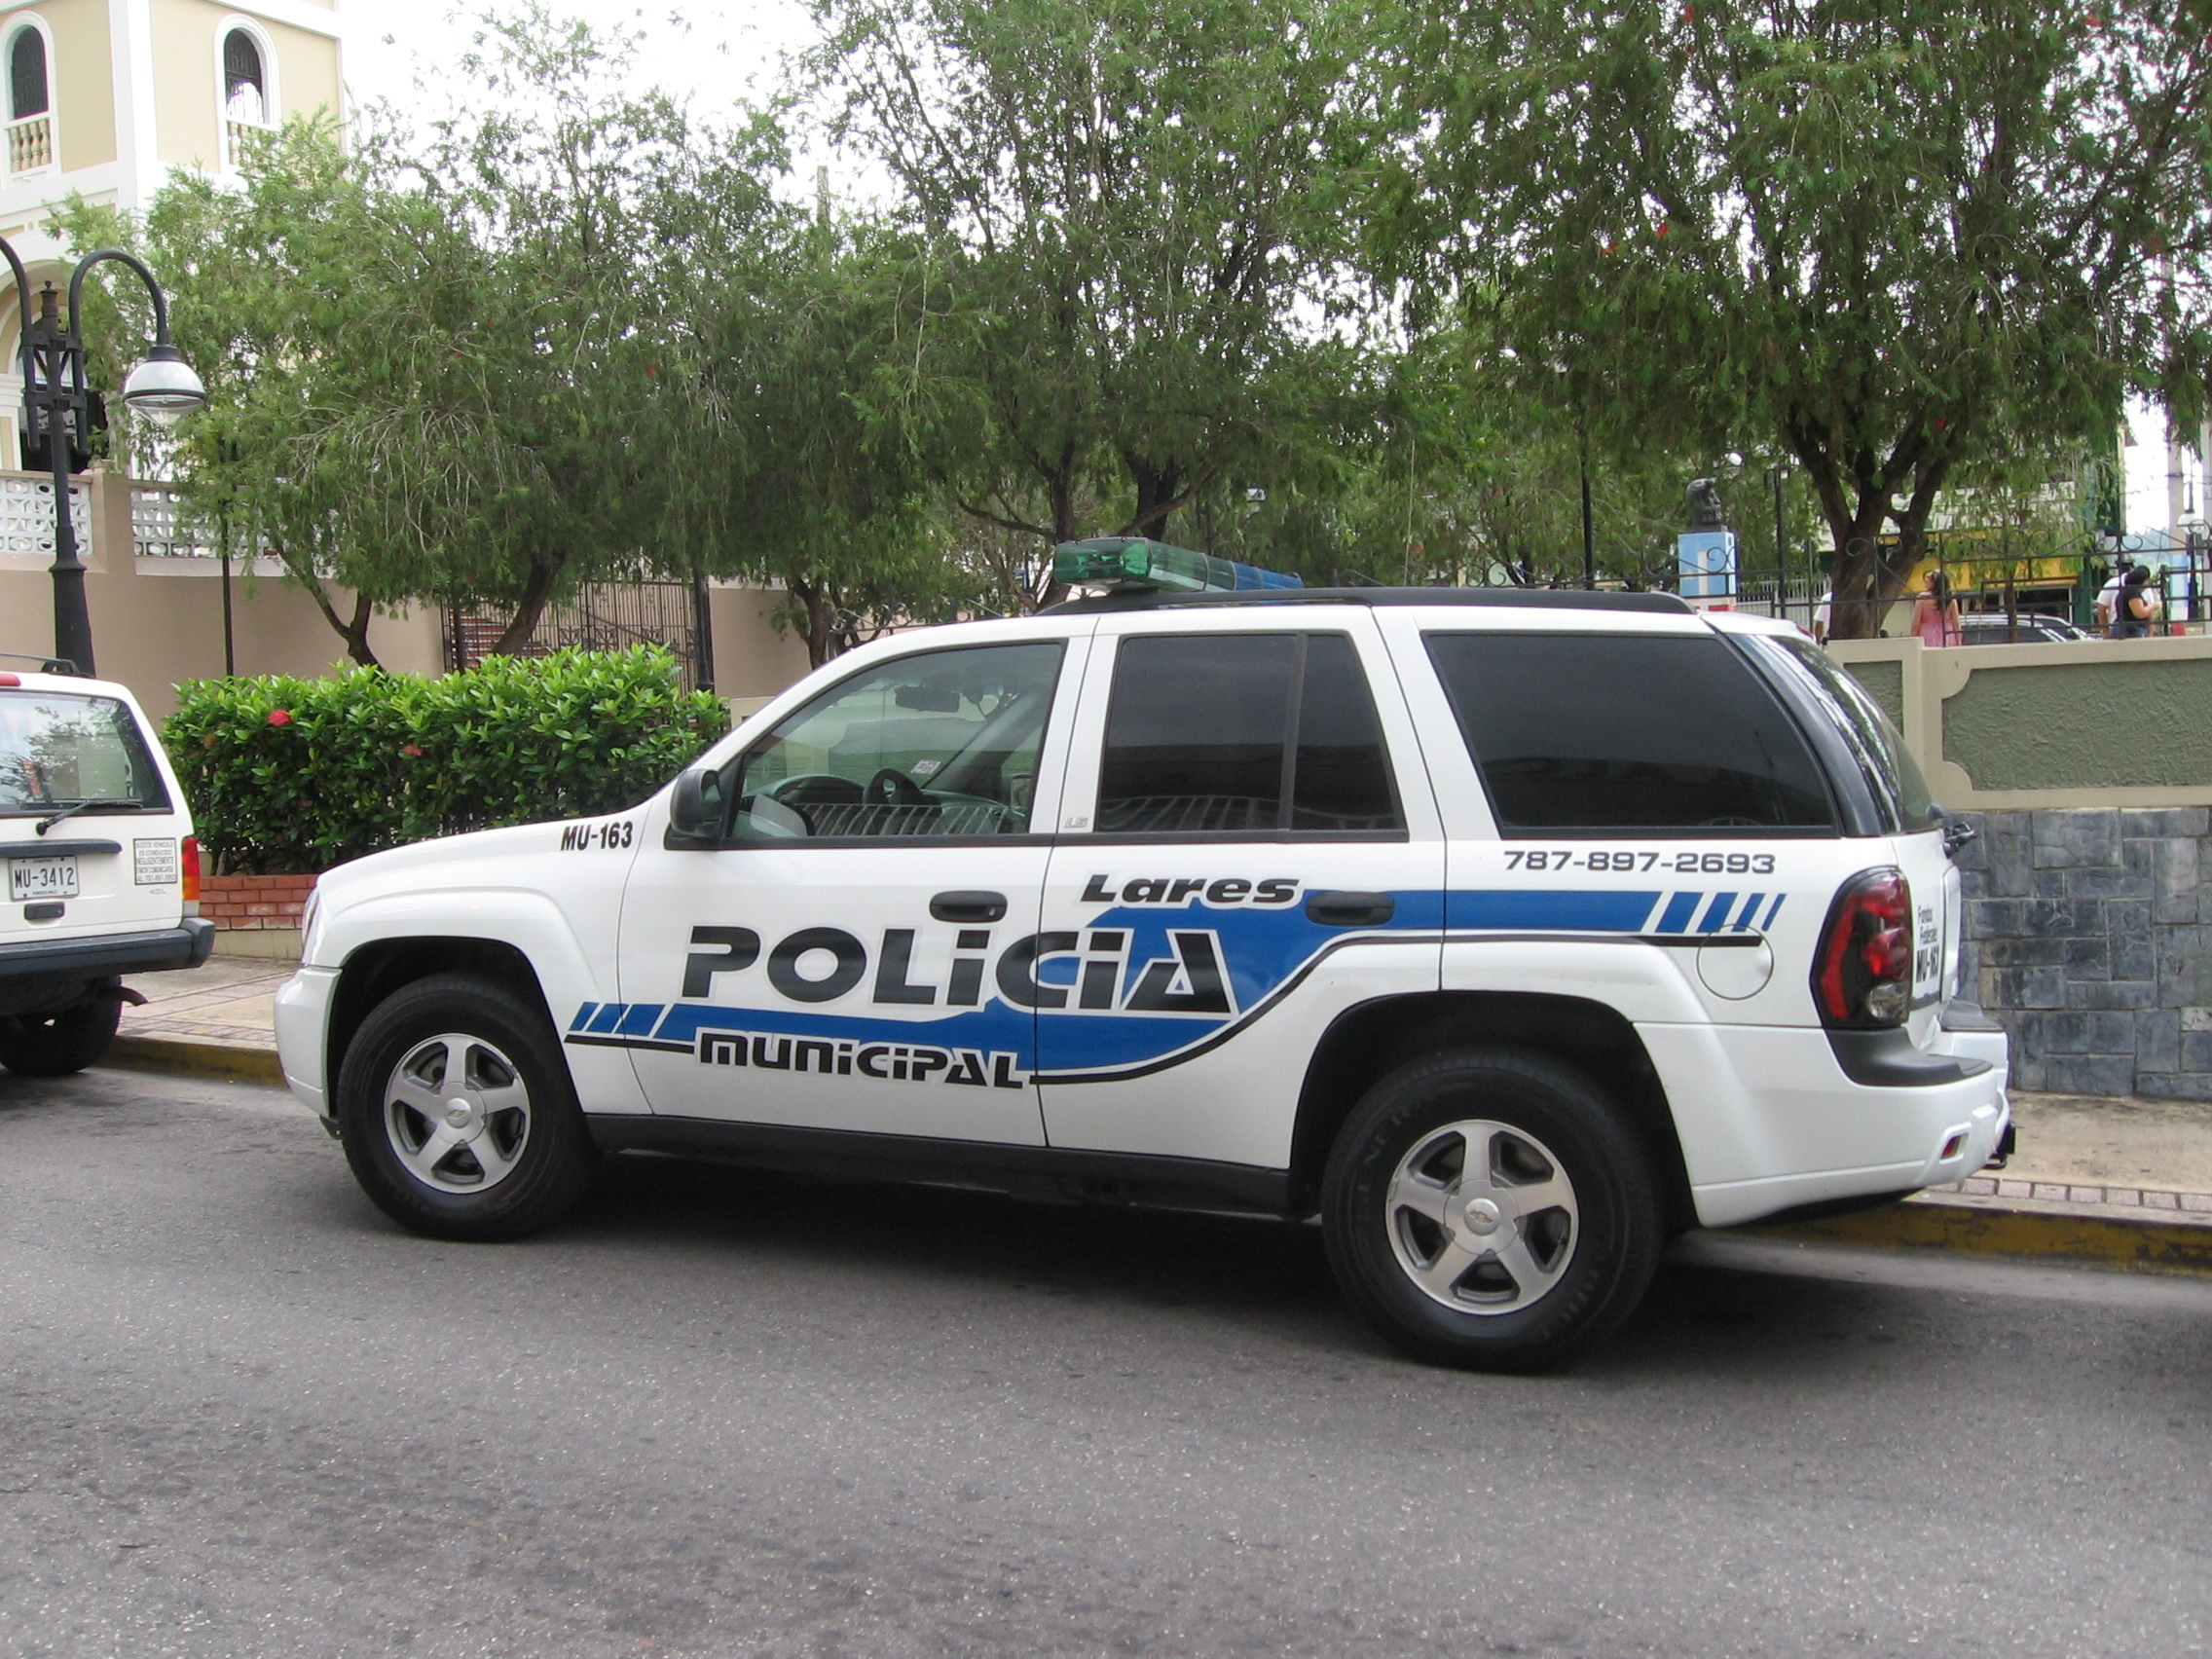 Puerto Rico Car Rental Require Cdw